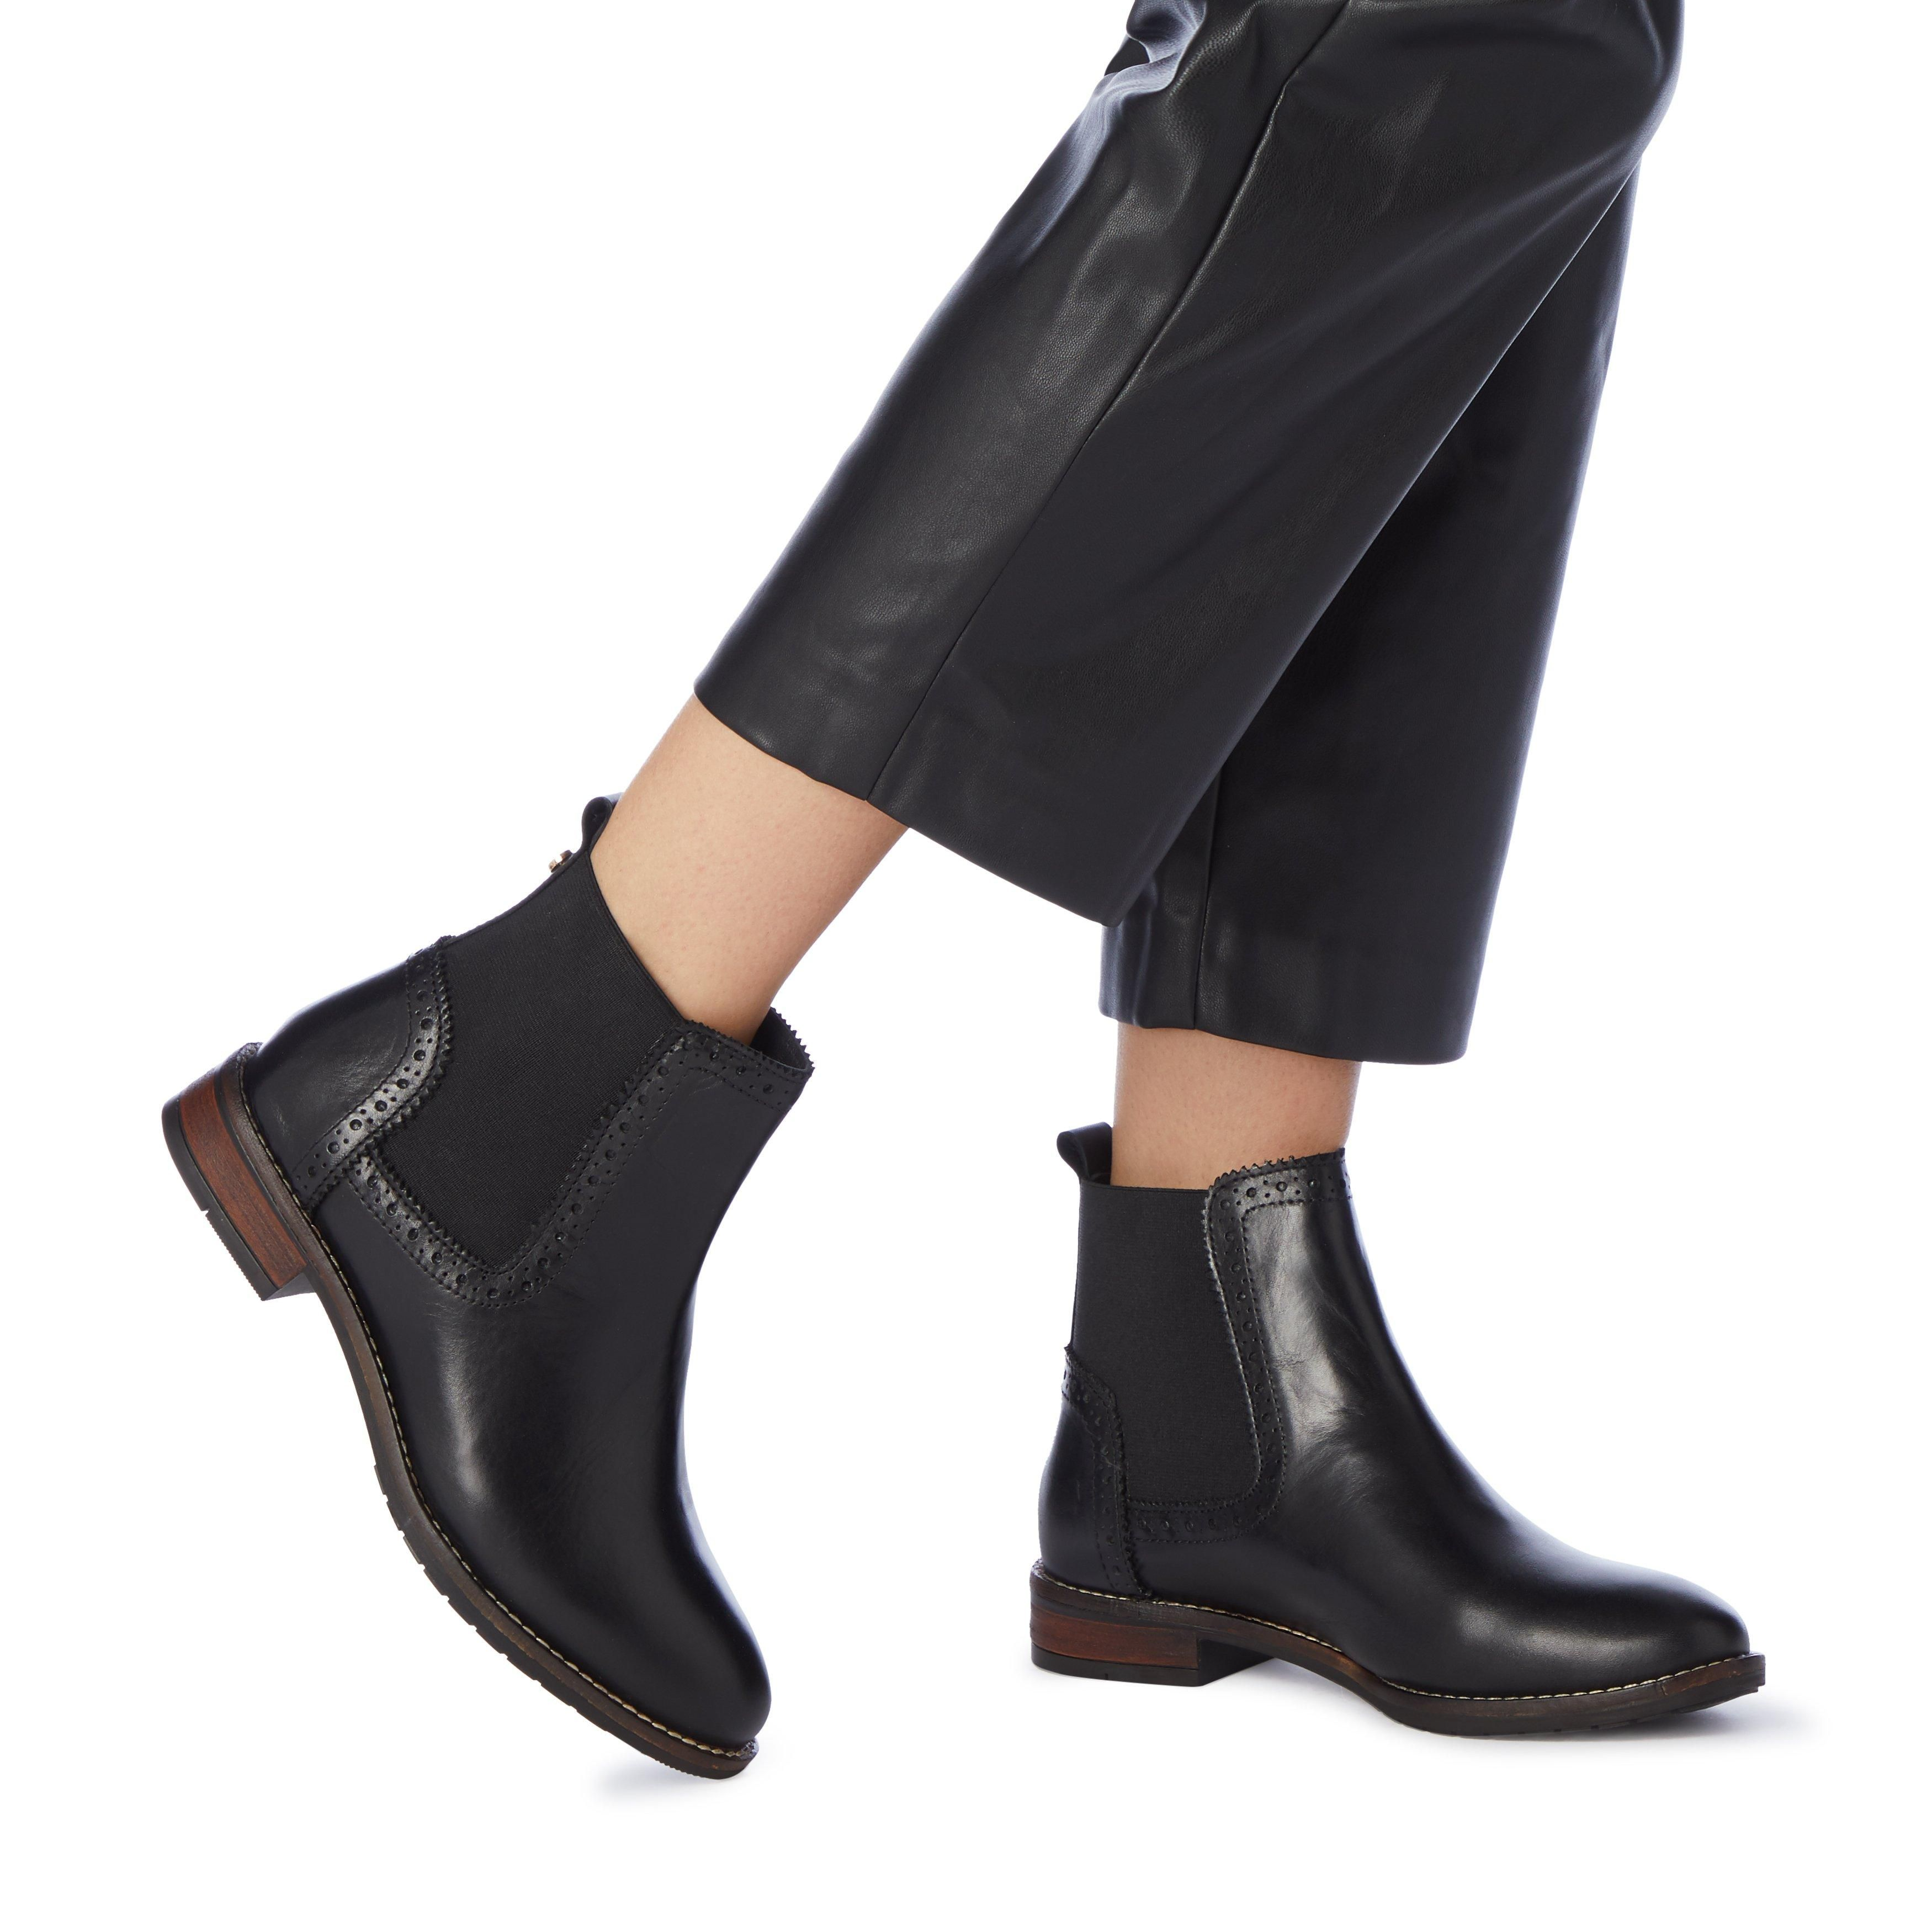 Dune Ladies WF QUANT Wide Fit Brogue Chelsea Boots